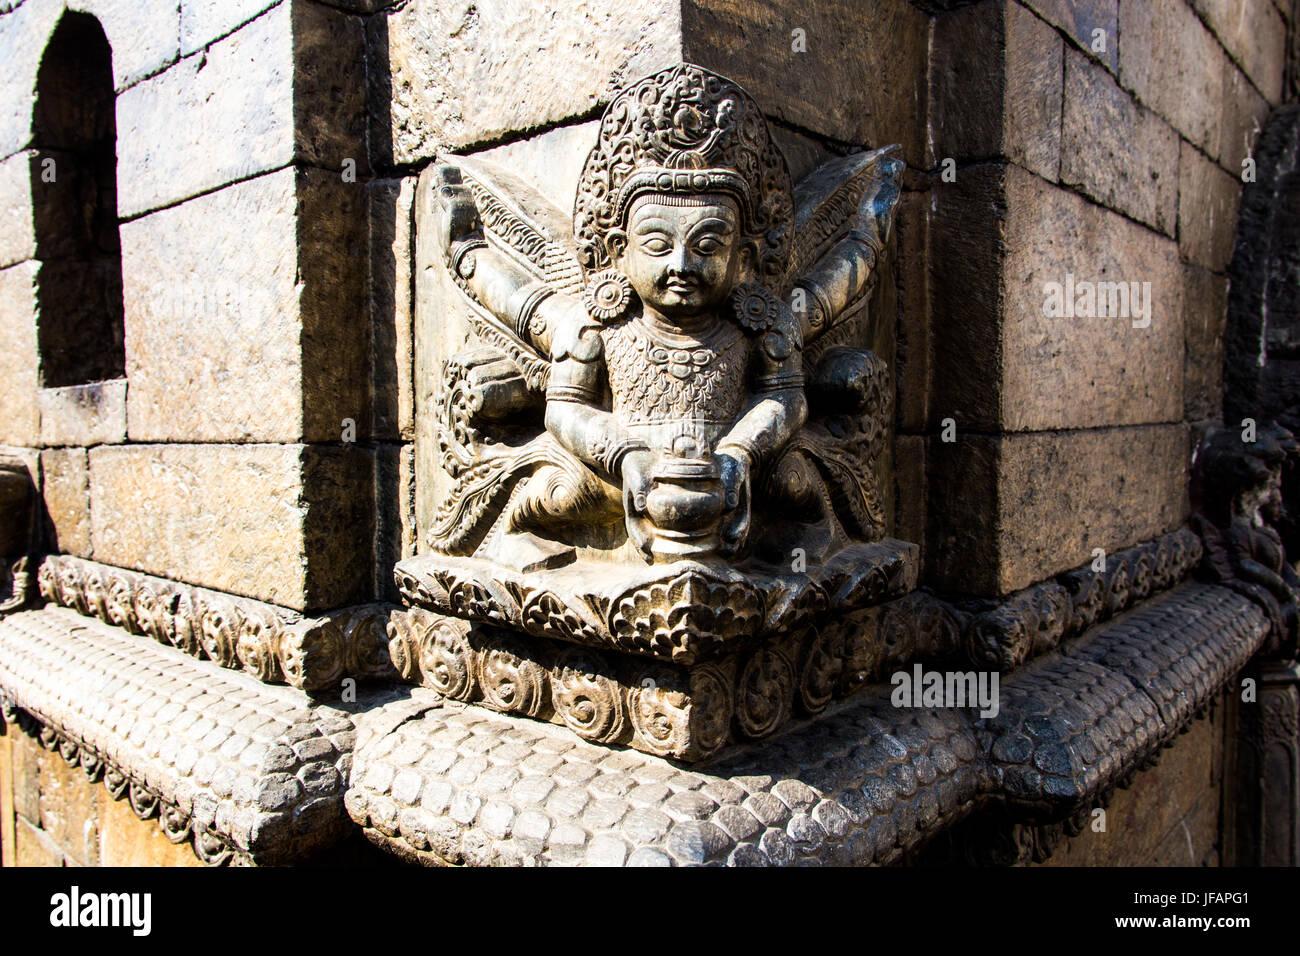 Carved details on a temple at Pashupatinath, Kathmandu, Nepal - Stock Image